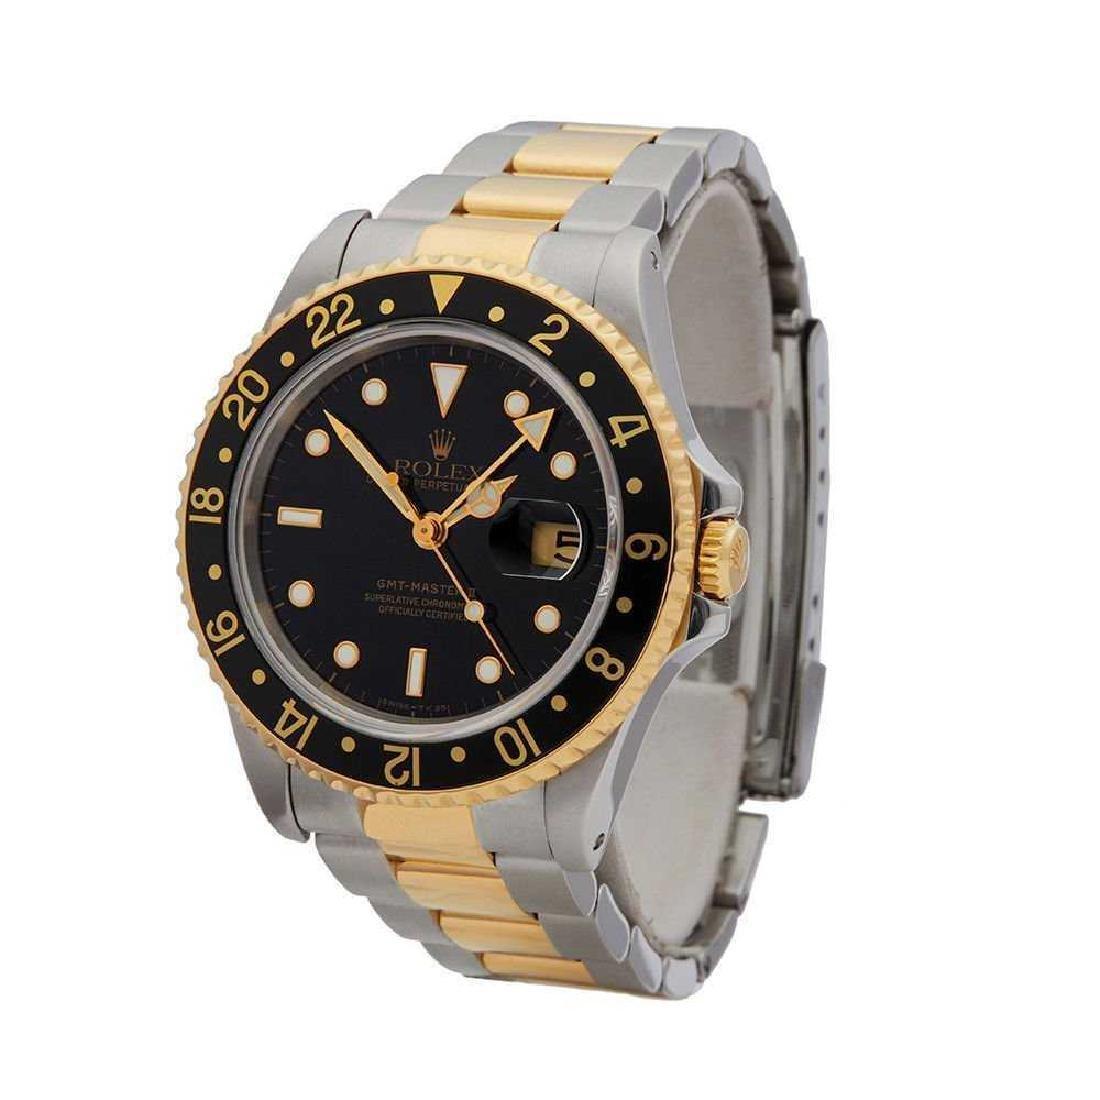 Rolex GMT Master II 16713, SS & 18K, Mens Watch. - 2